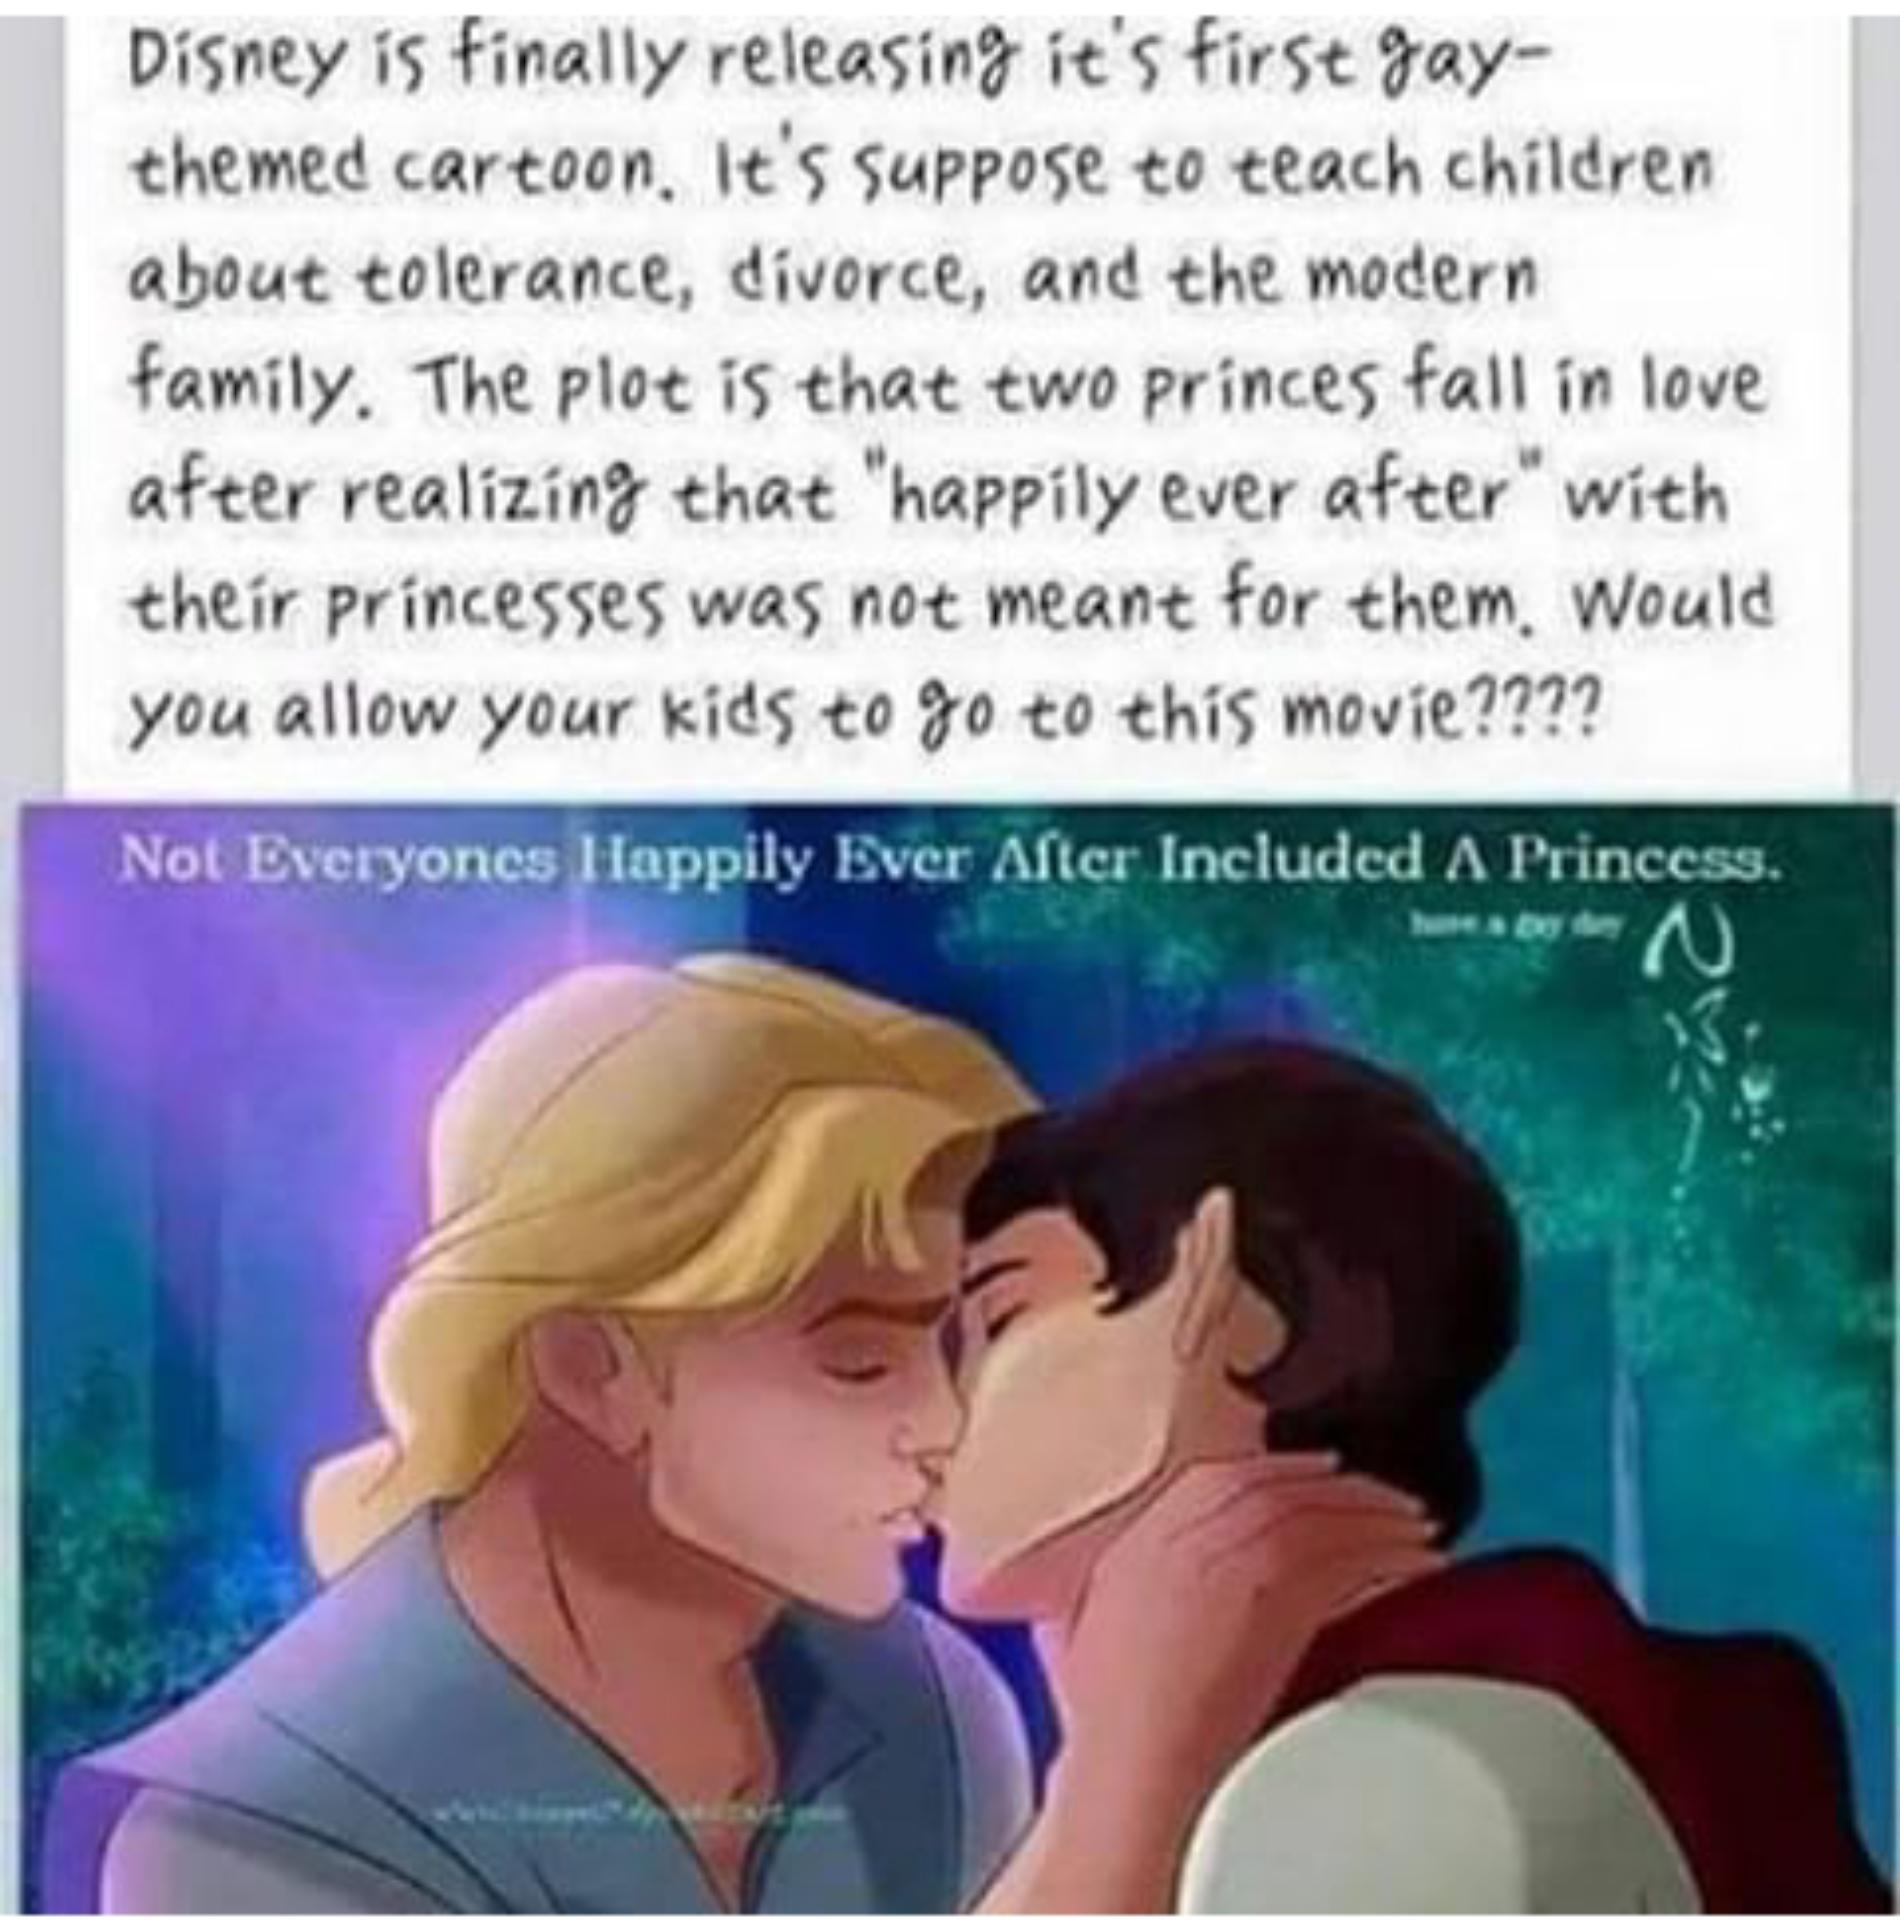 Photo: A Disney Story Without A Princess?